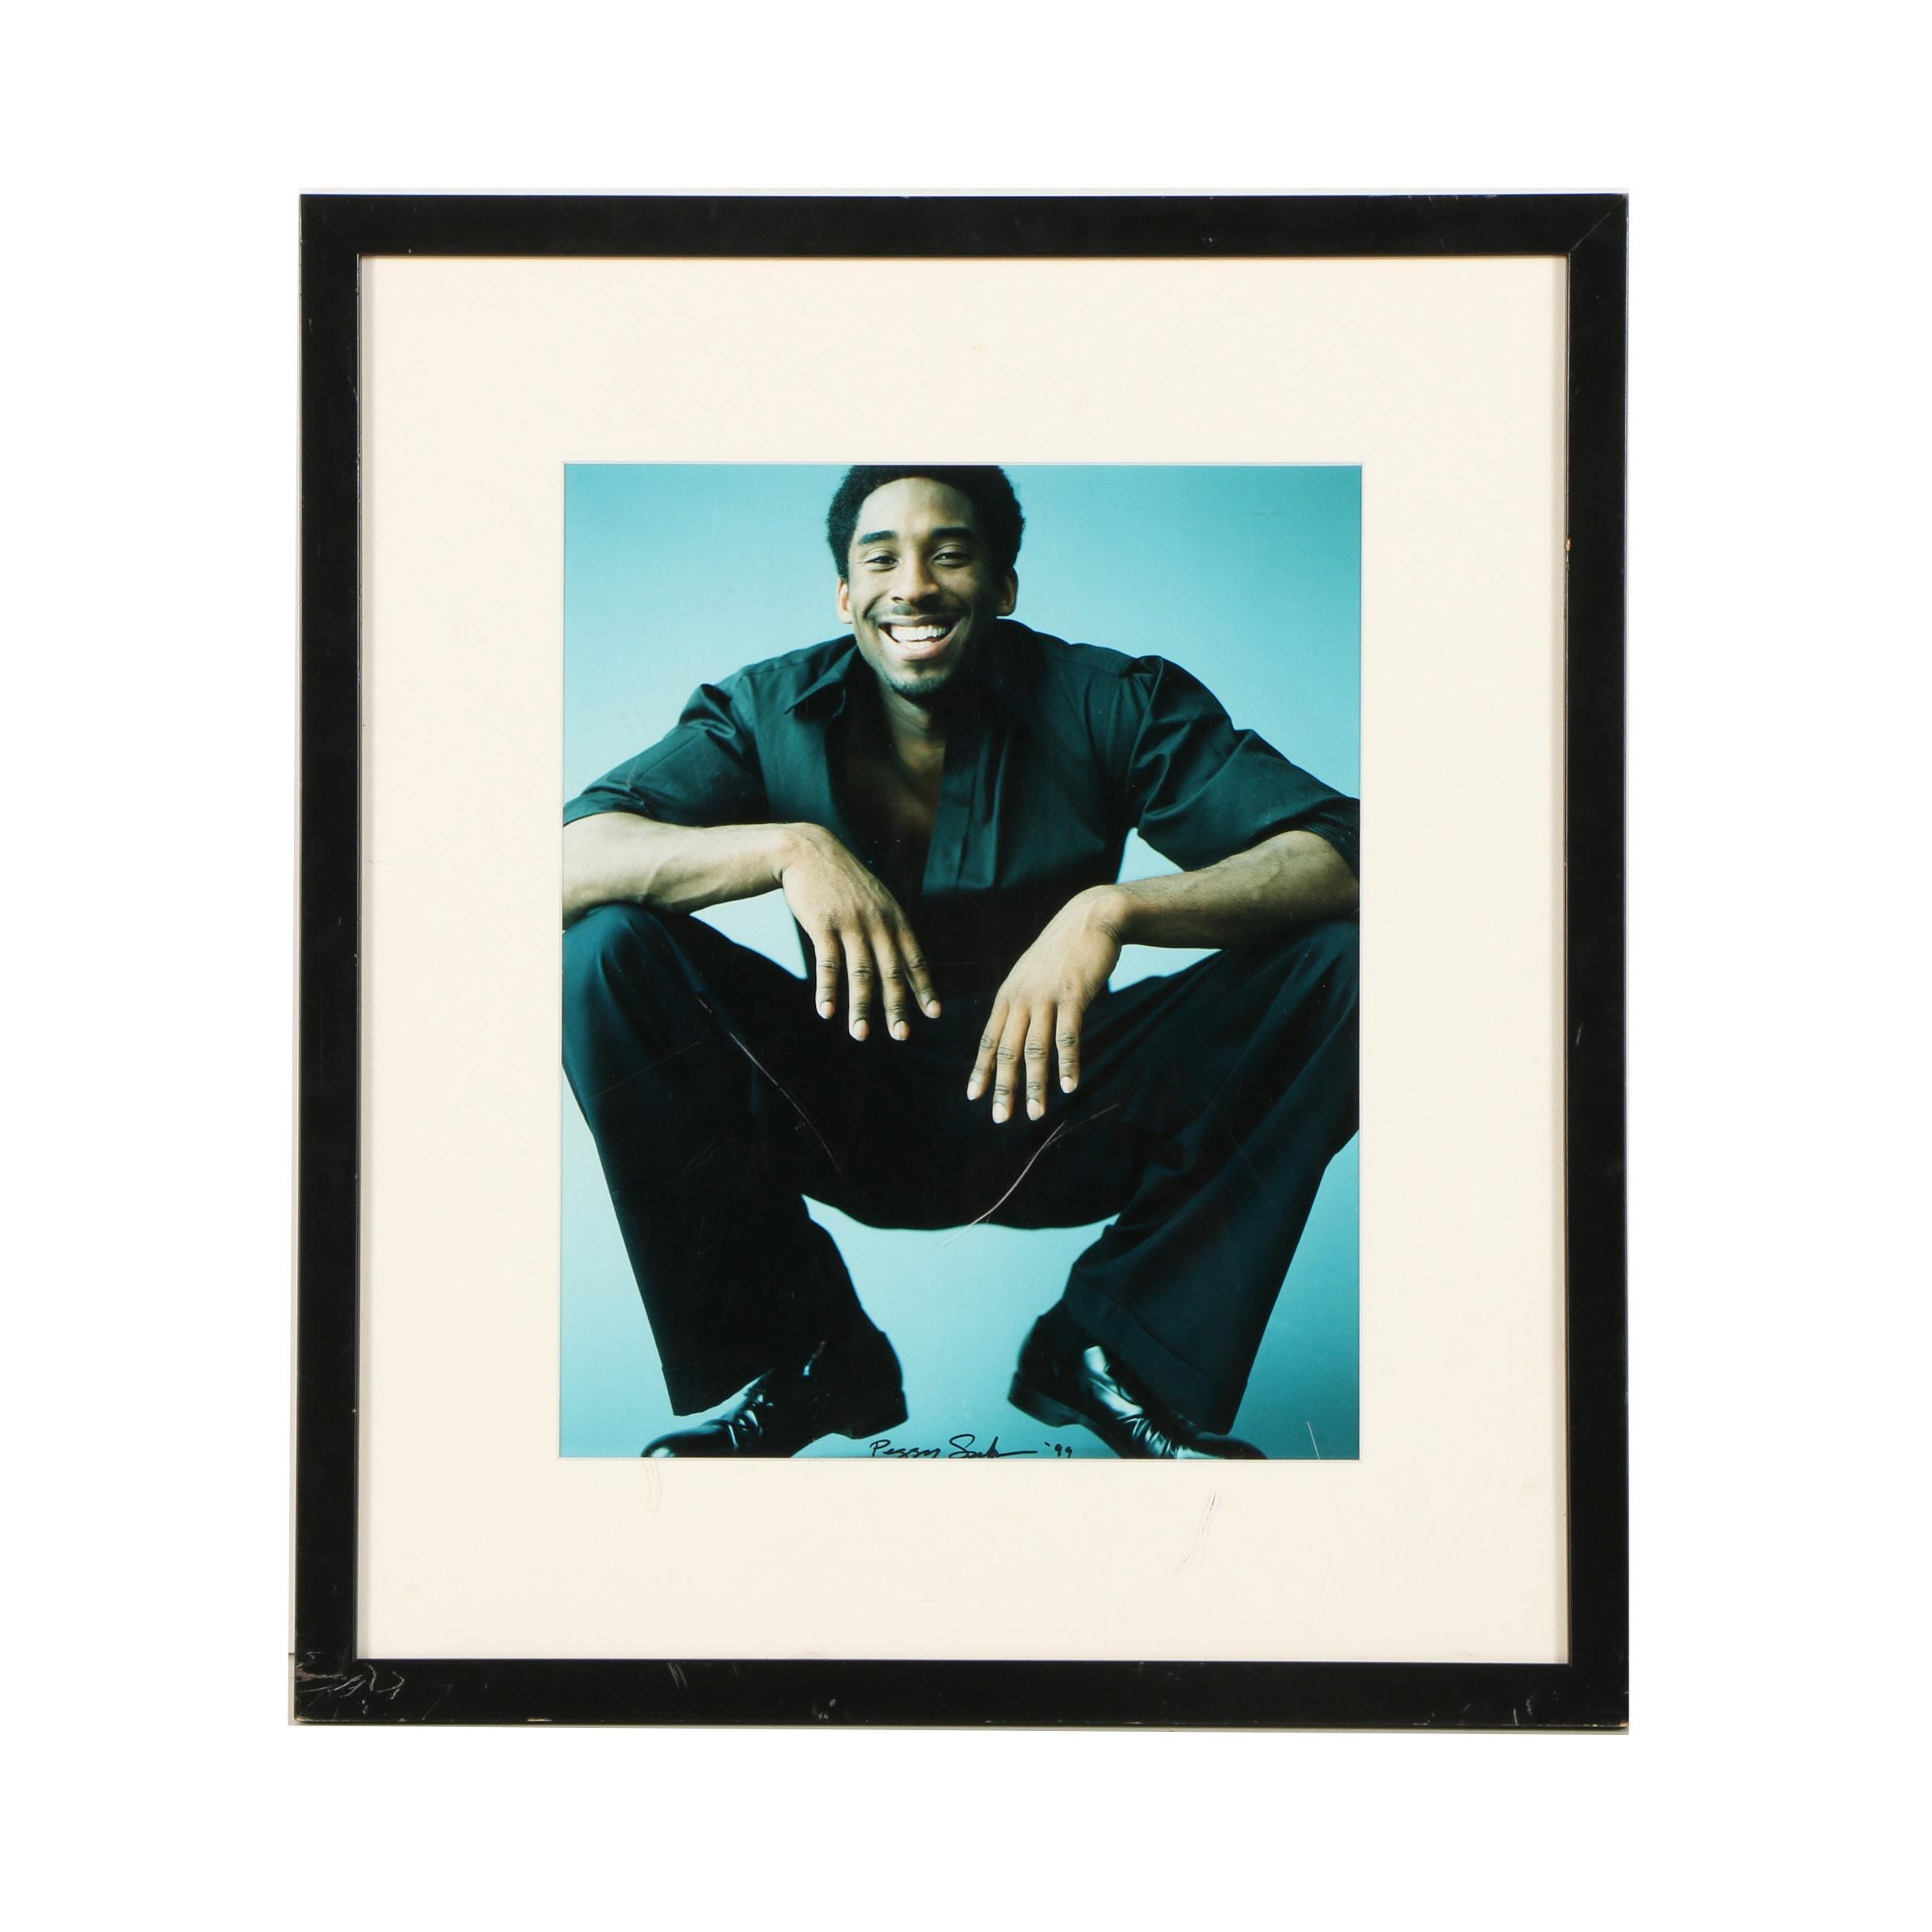 Digital Photograph of Kobe Bryant